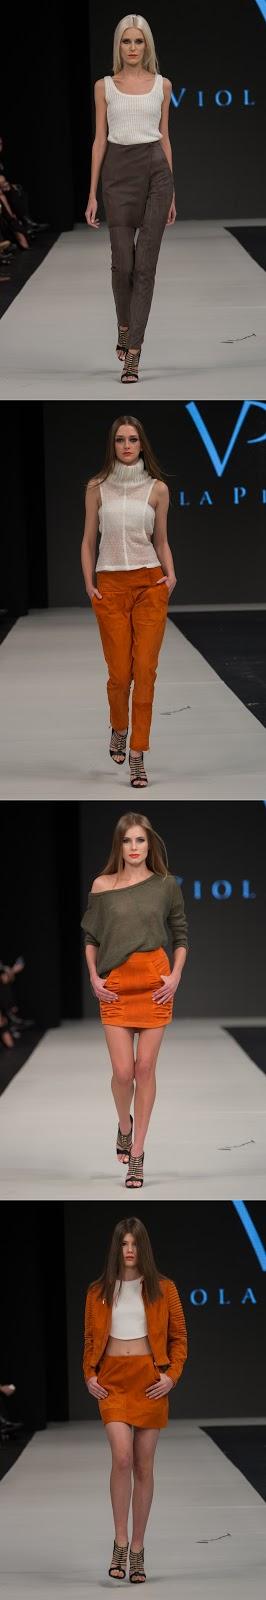 Viola Piekut XIII FashionPhilosophy Fashion Week Poland 2015 (c) 2015 Mike Pasarella